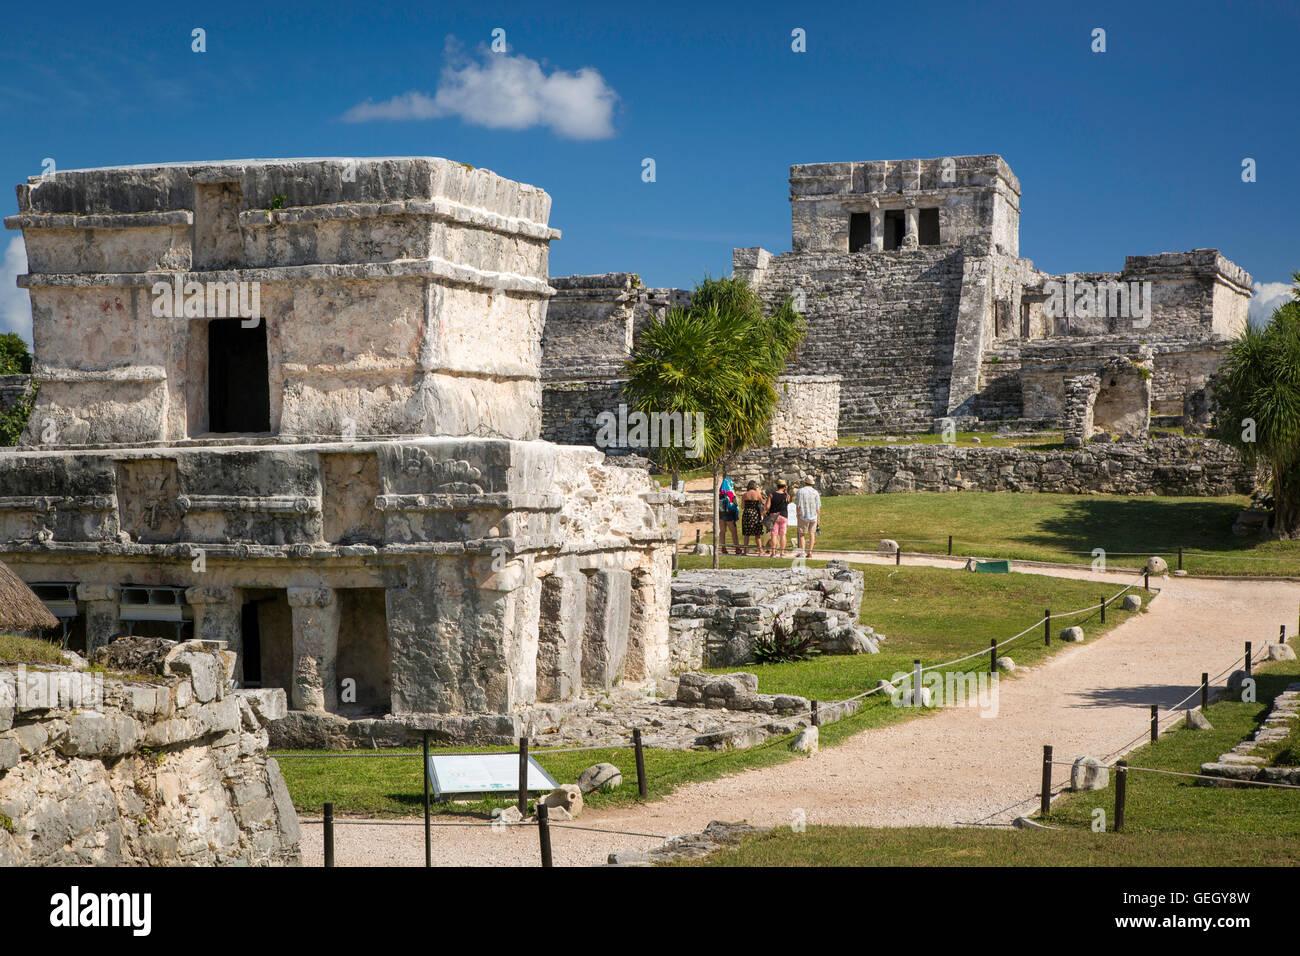 Ruinen der Maya-Tempel-Anlage in Tulum, Mexiko, Yucatan, Quintana Roo Stockbild